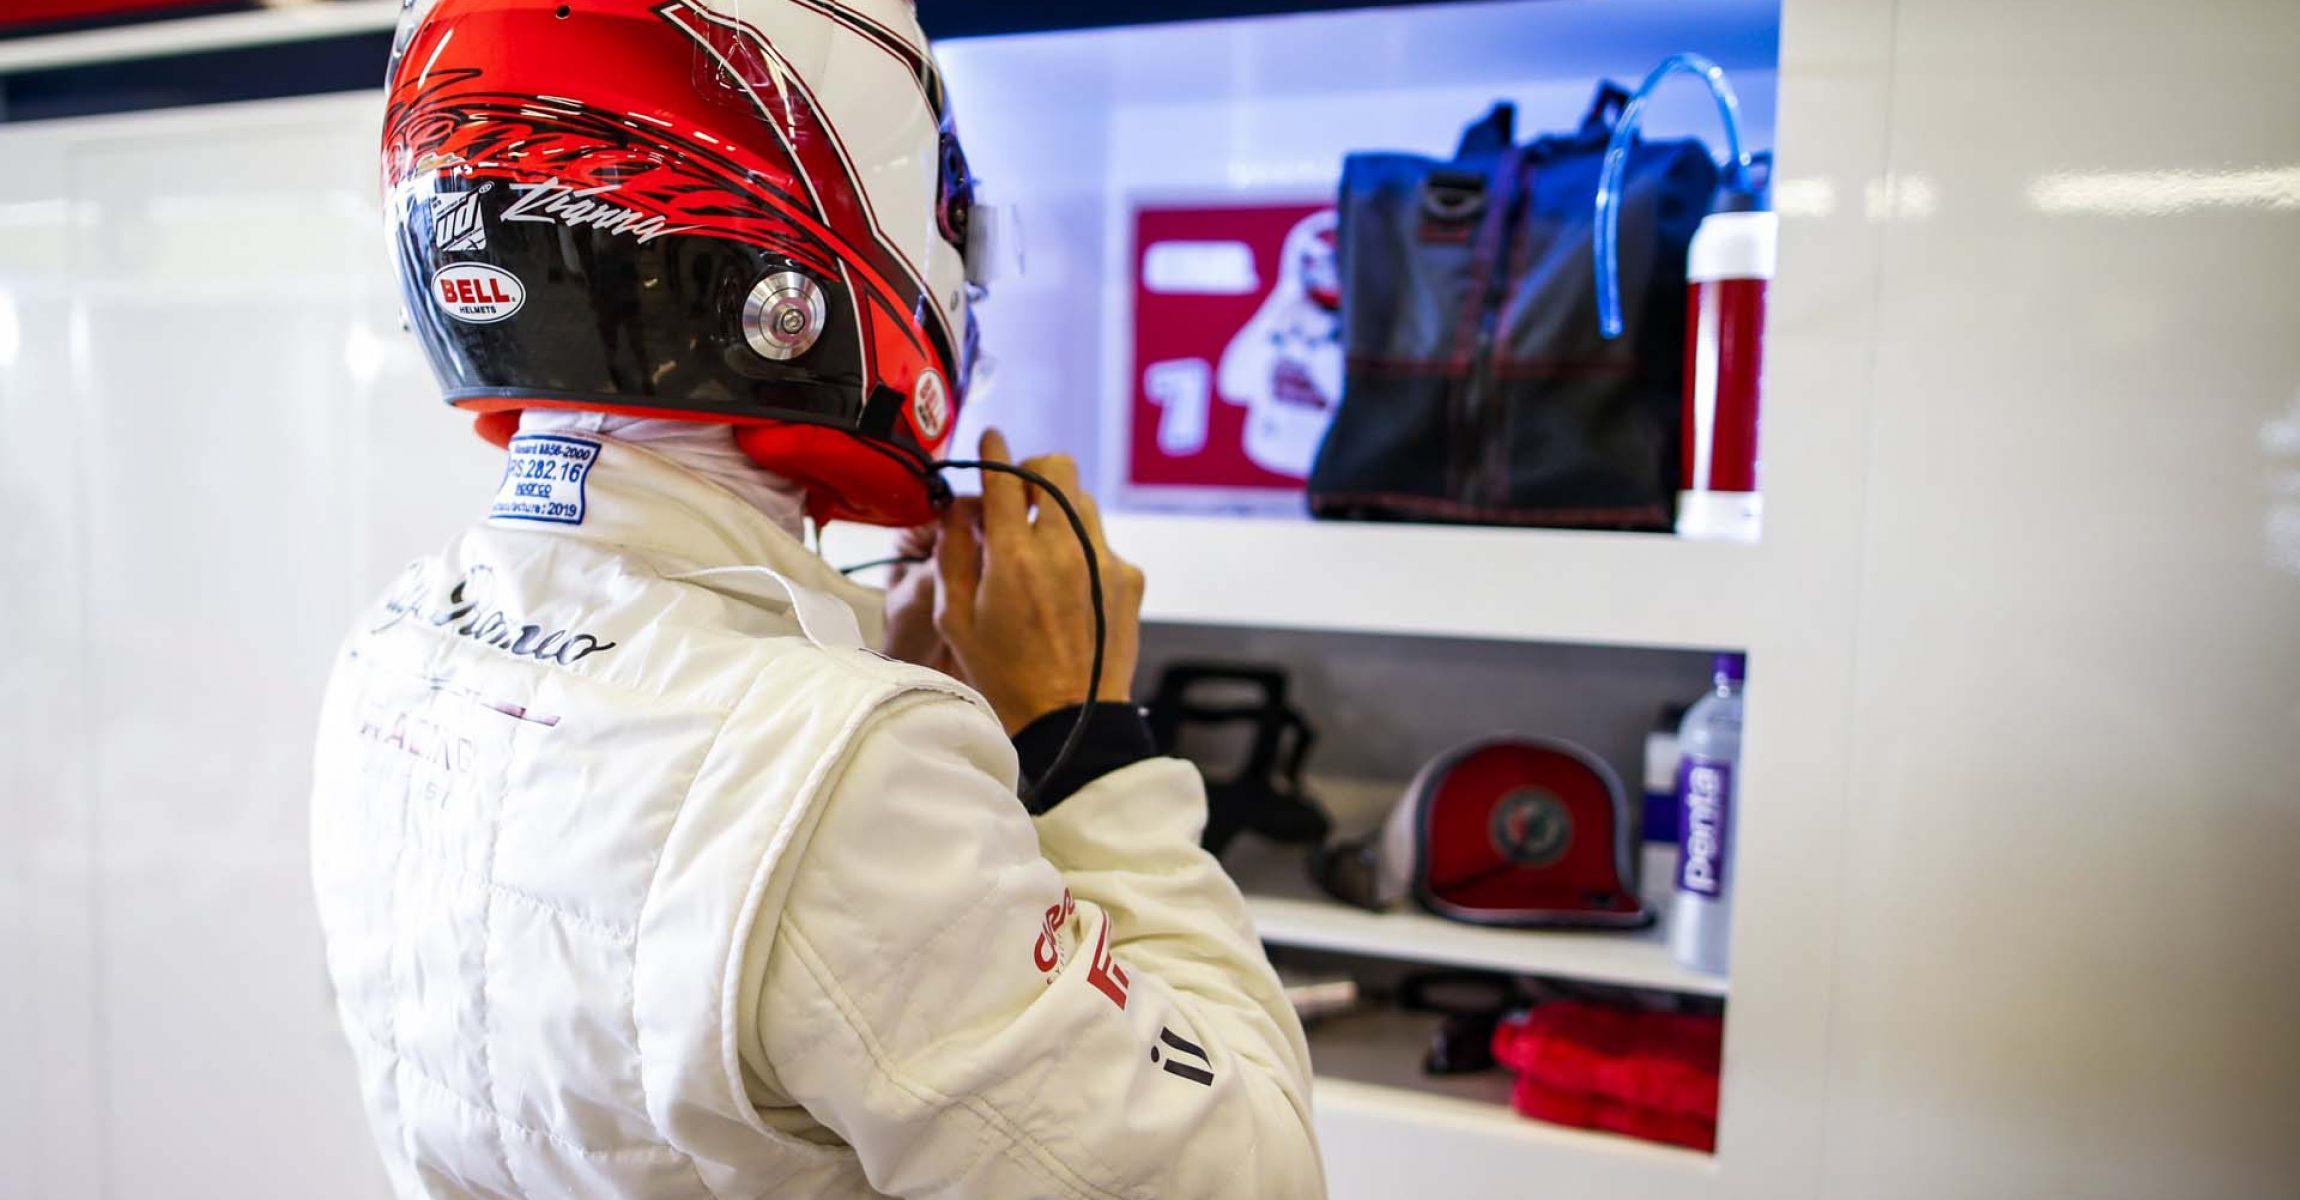 RAIKKONEN Kimi Räikkönen (fin), Alfa Romeo Racing C38, portrait during the 2019 Formula One World Championship, Abu Dhabi Grand Prix from November 28 to december 1 in Yas Marina - Photo Florent Gooden / DPPI